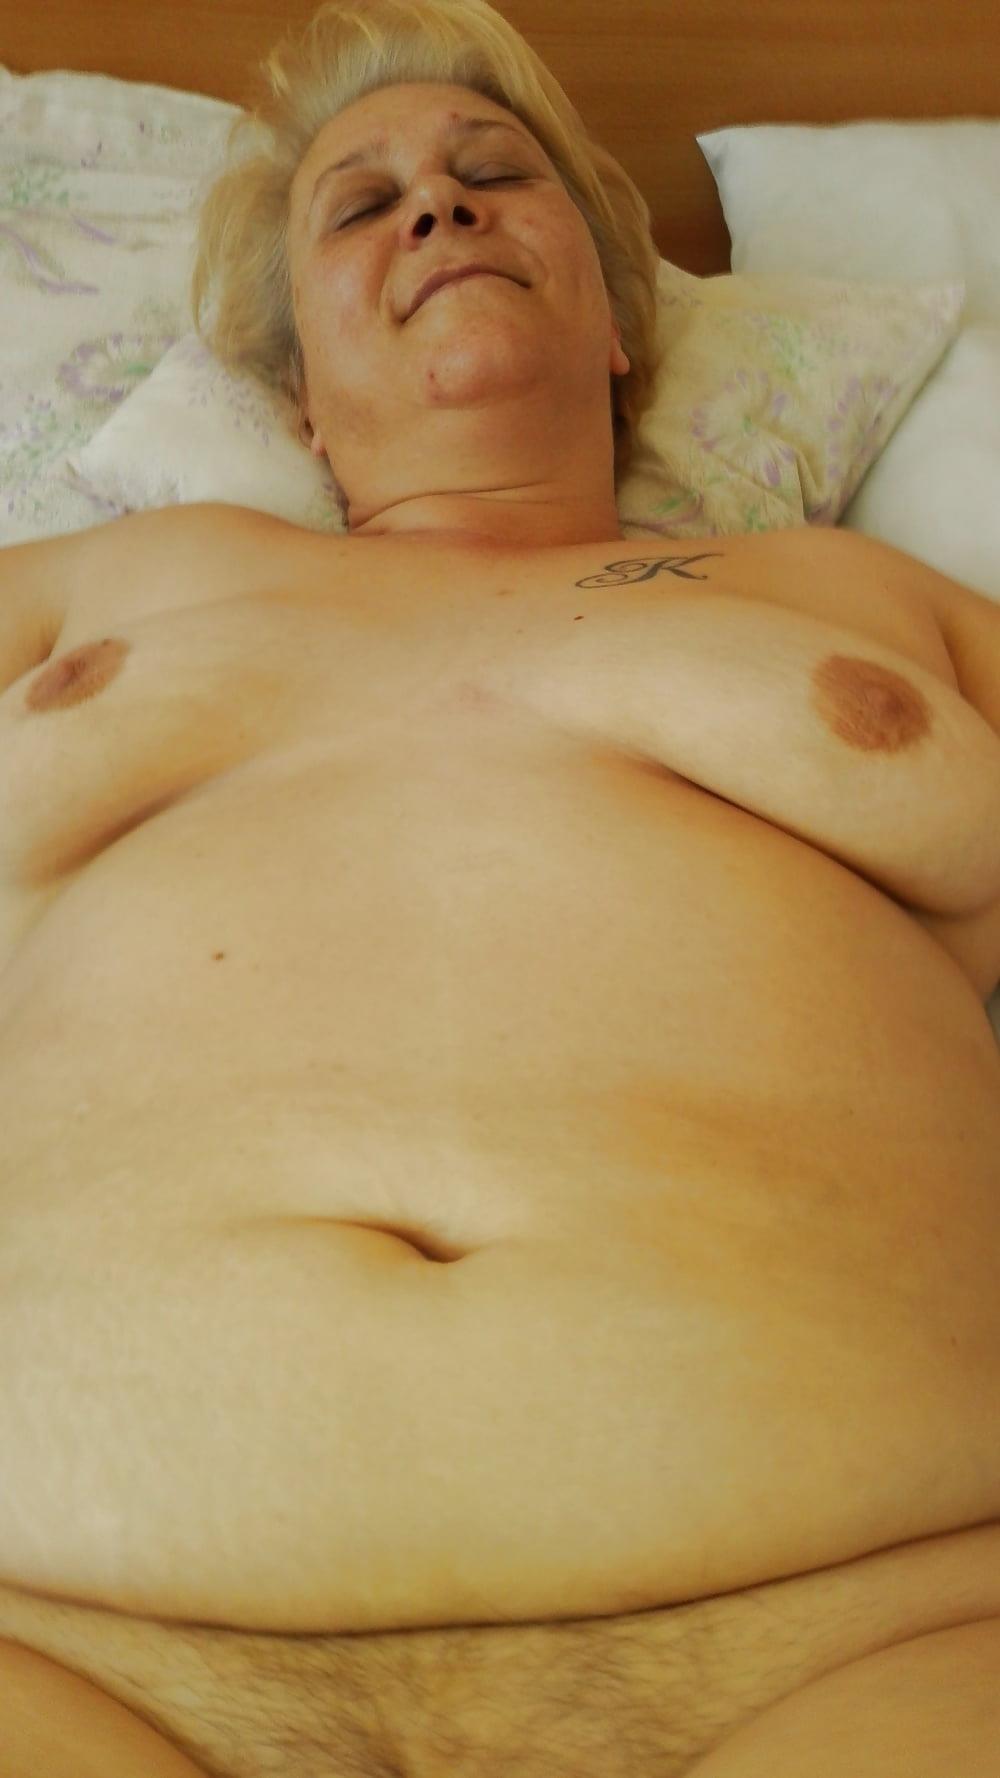 Big tits creampie pics-8990